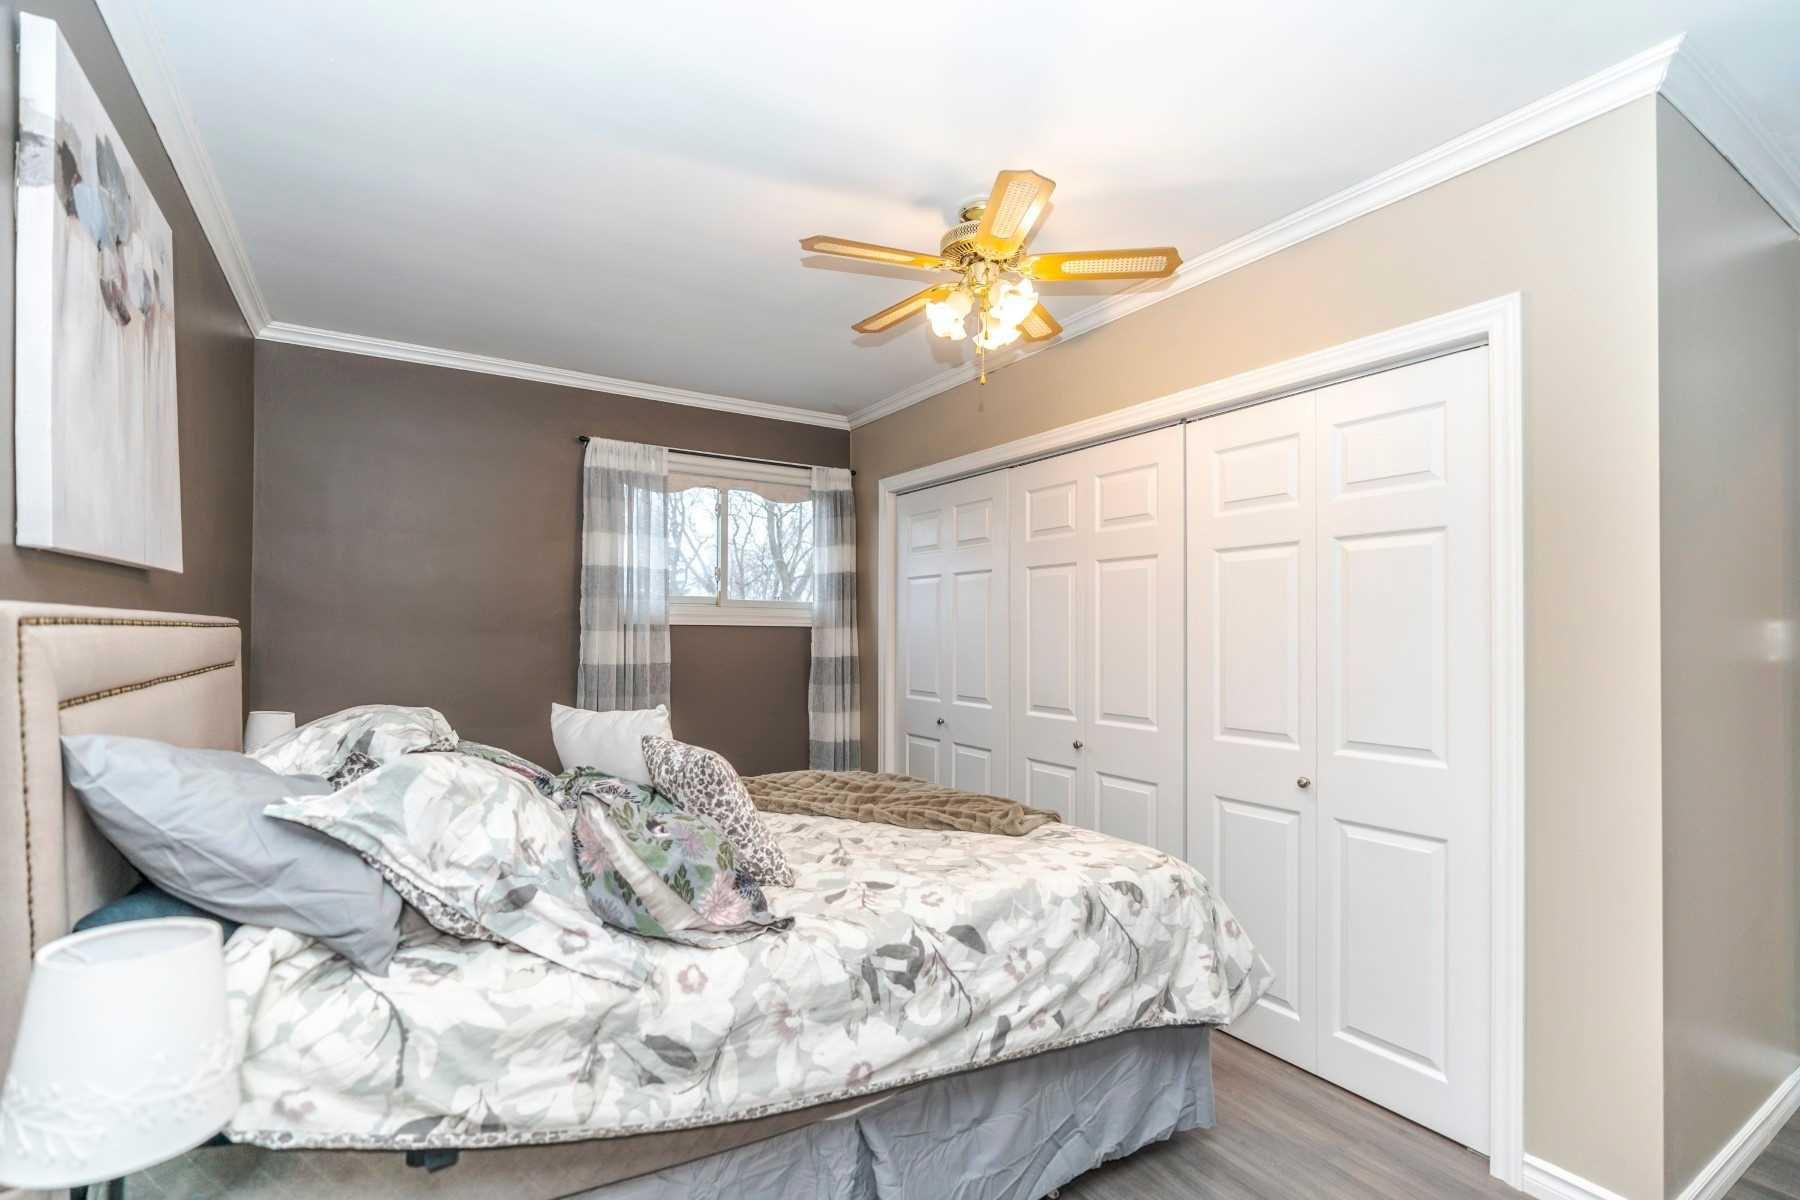 Photo 10: Photos: 190 N Church Street in Clarington: Orono House (Sidesplit 4) for sale : MLS®# E4463047